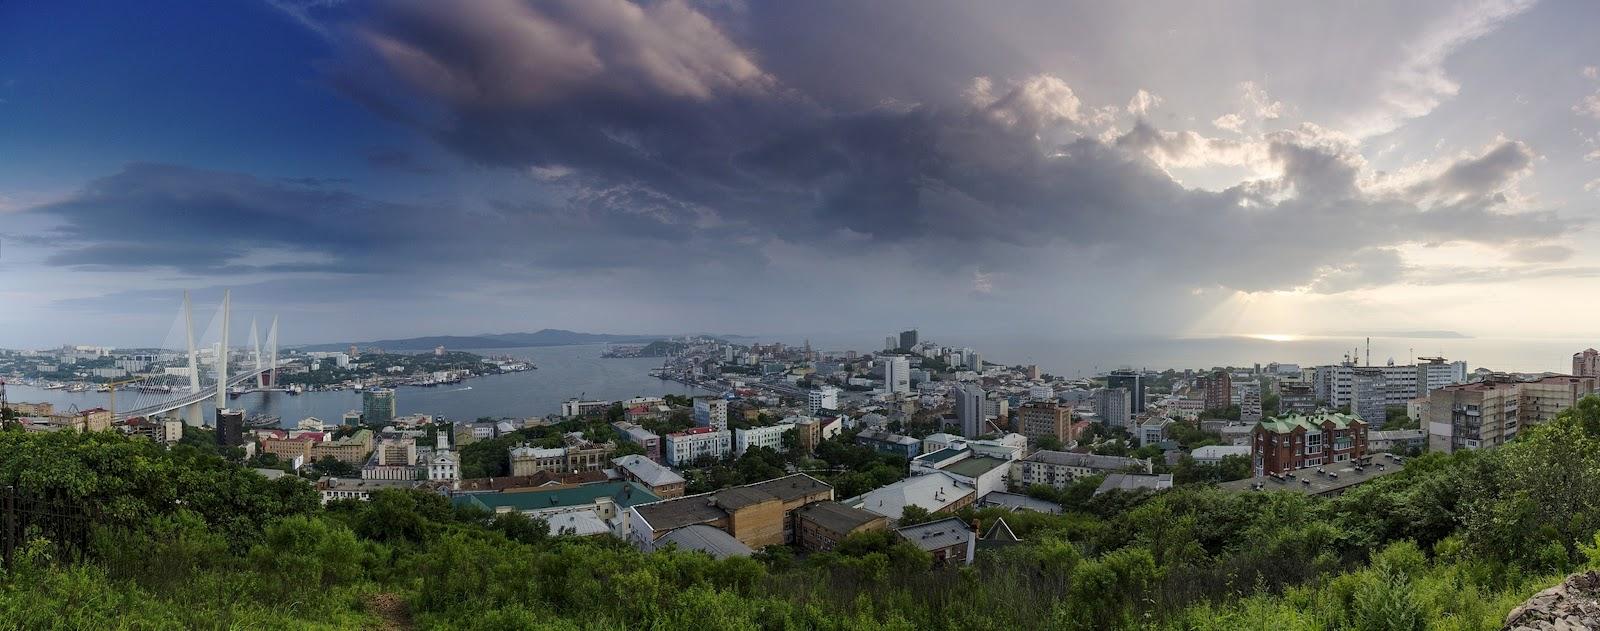 владивосток панорамные фото города